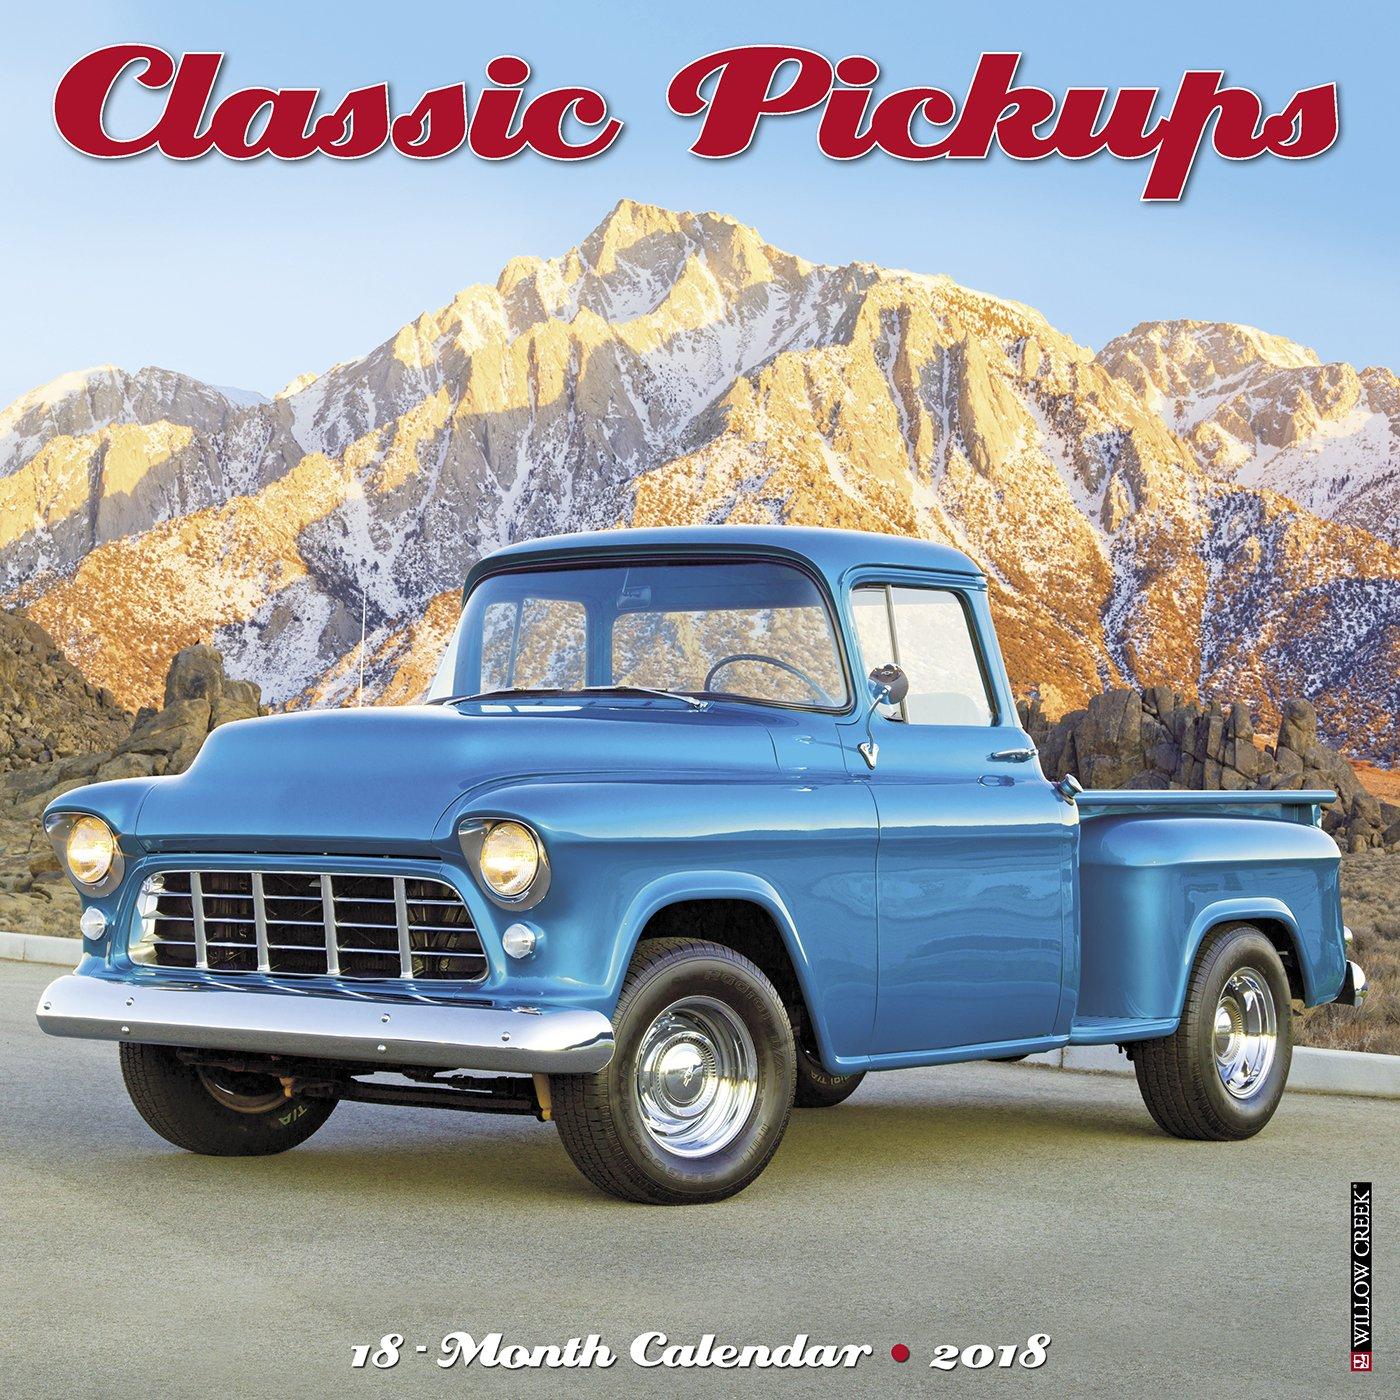 Classic Pickups 2018 Calendar: Willow Creek Press: 9781682344569 ...